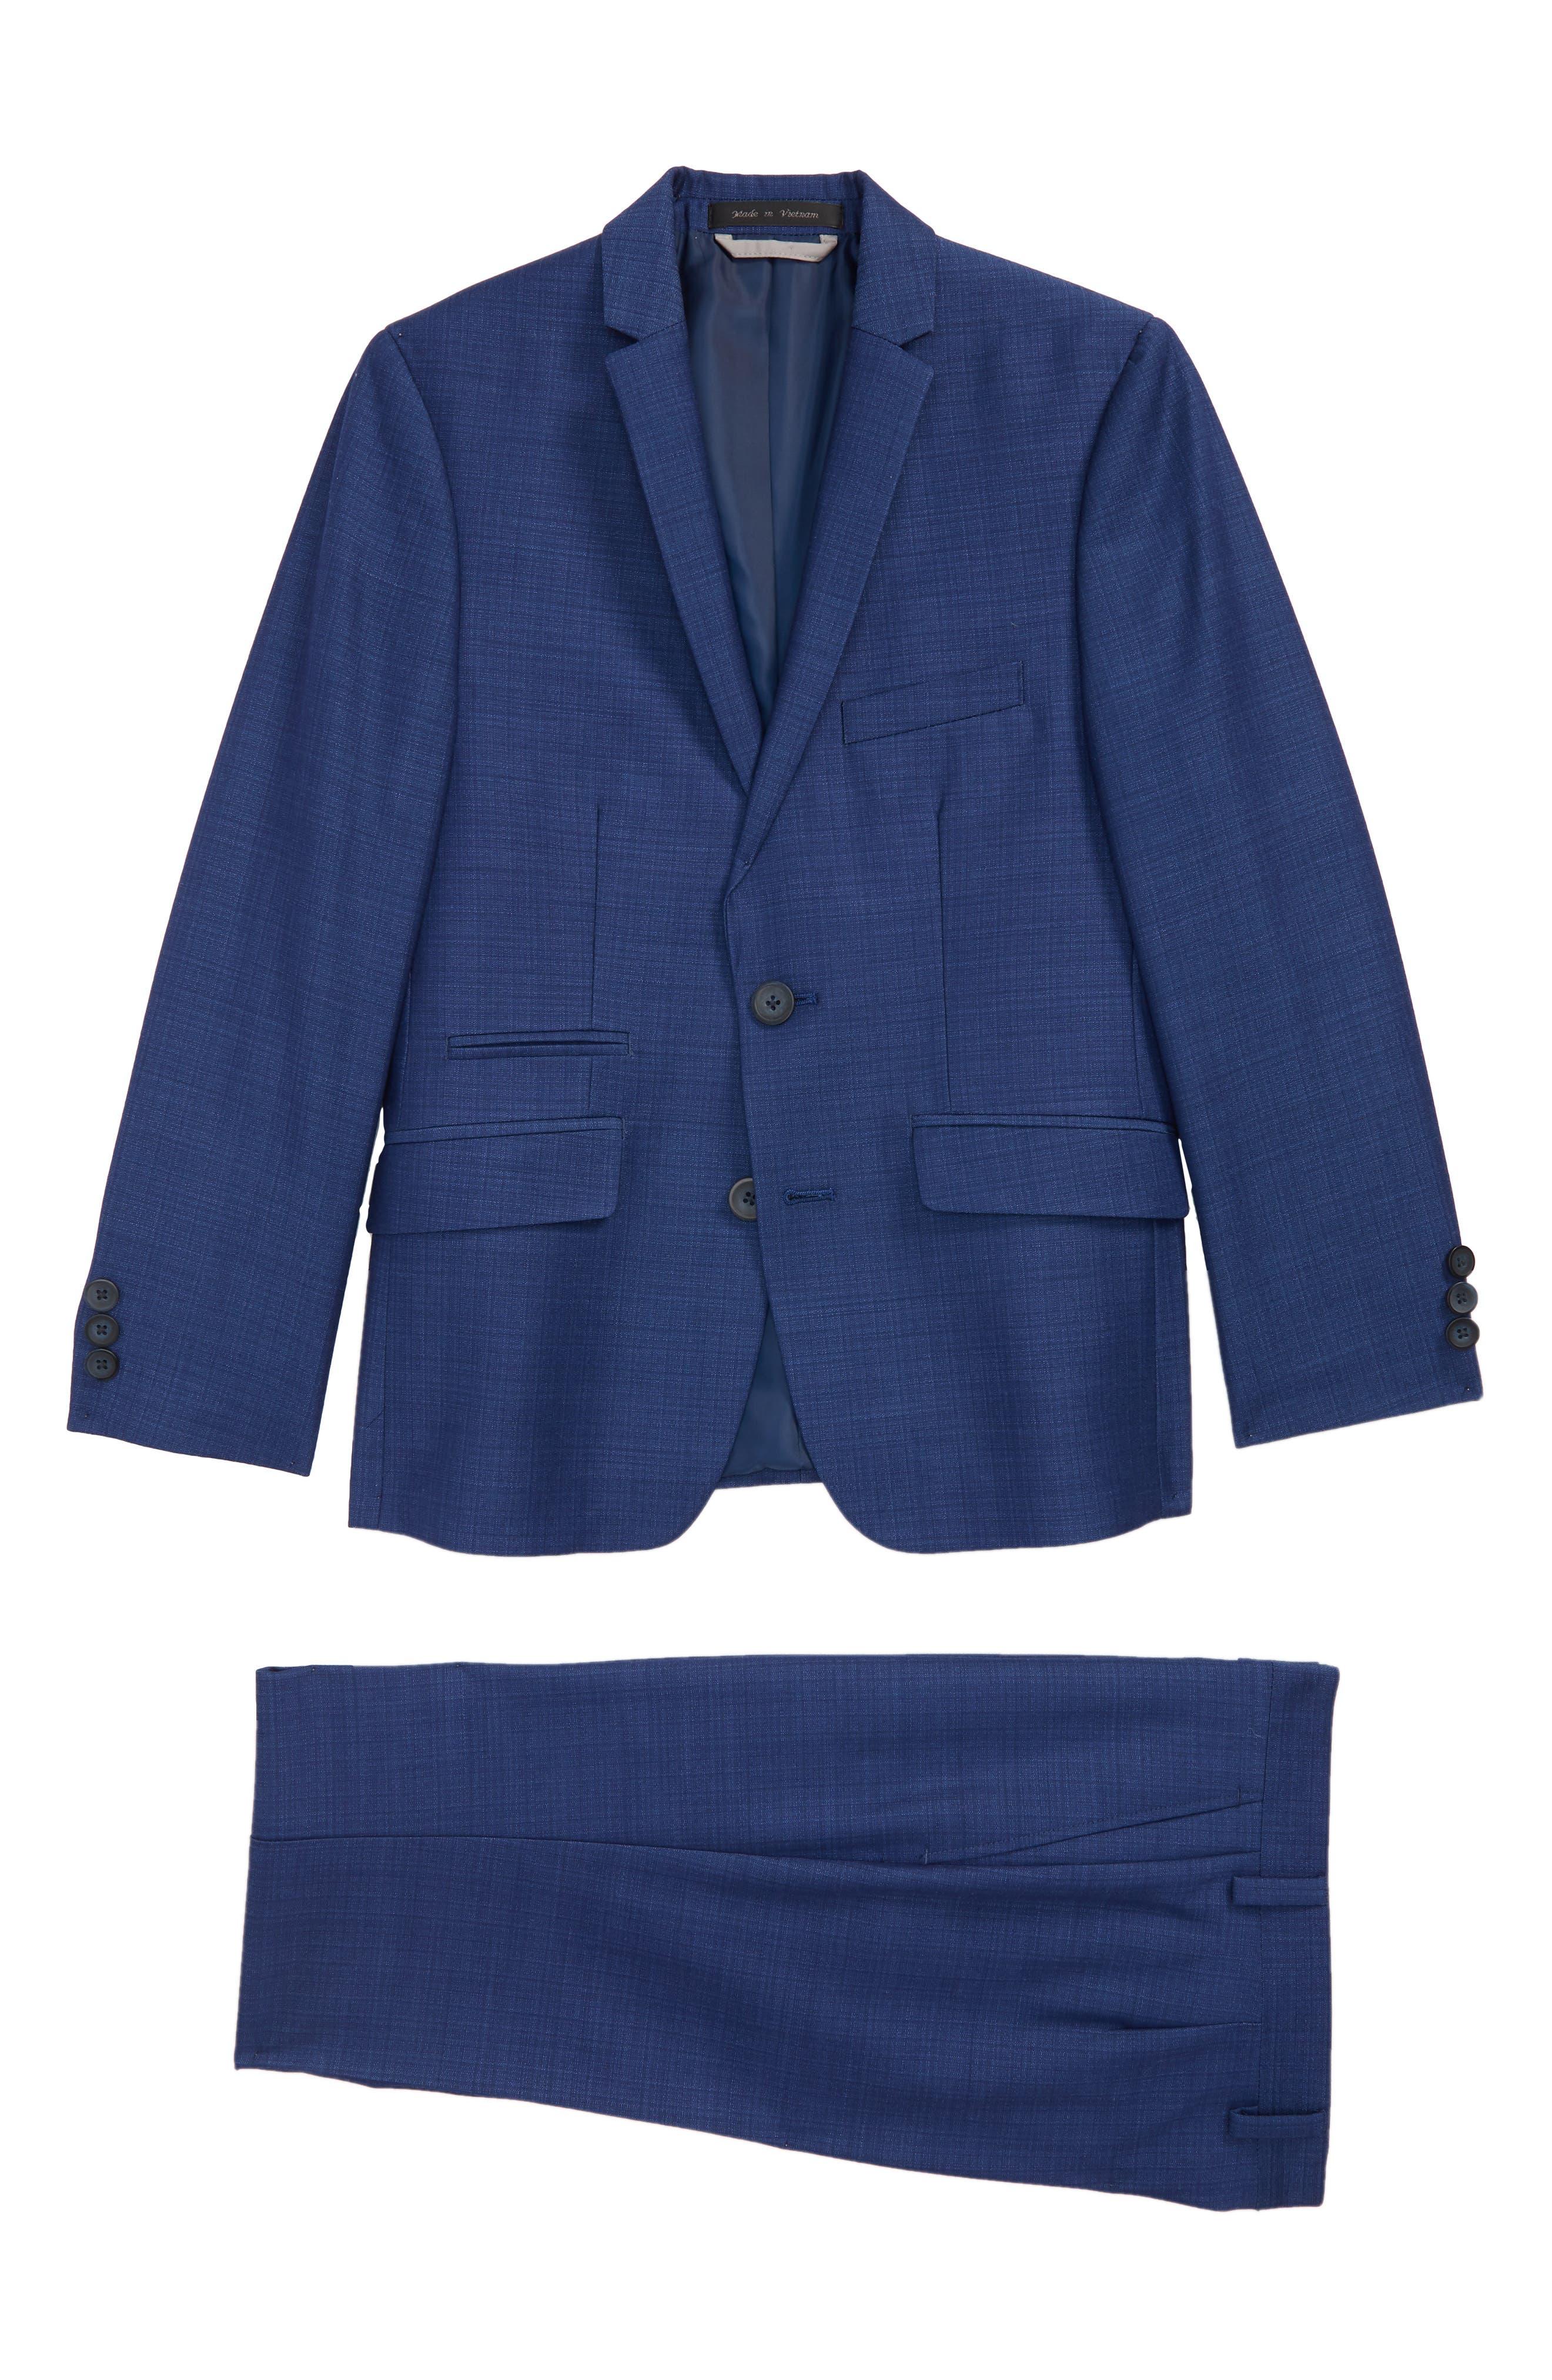 Textured Suit,                             Main thumbnail 1, color,                             Blue/ Navy